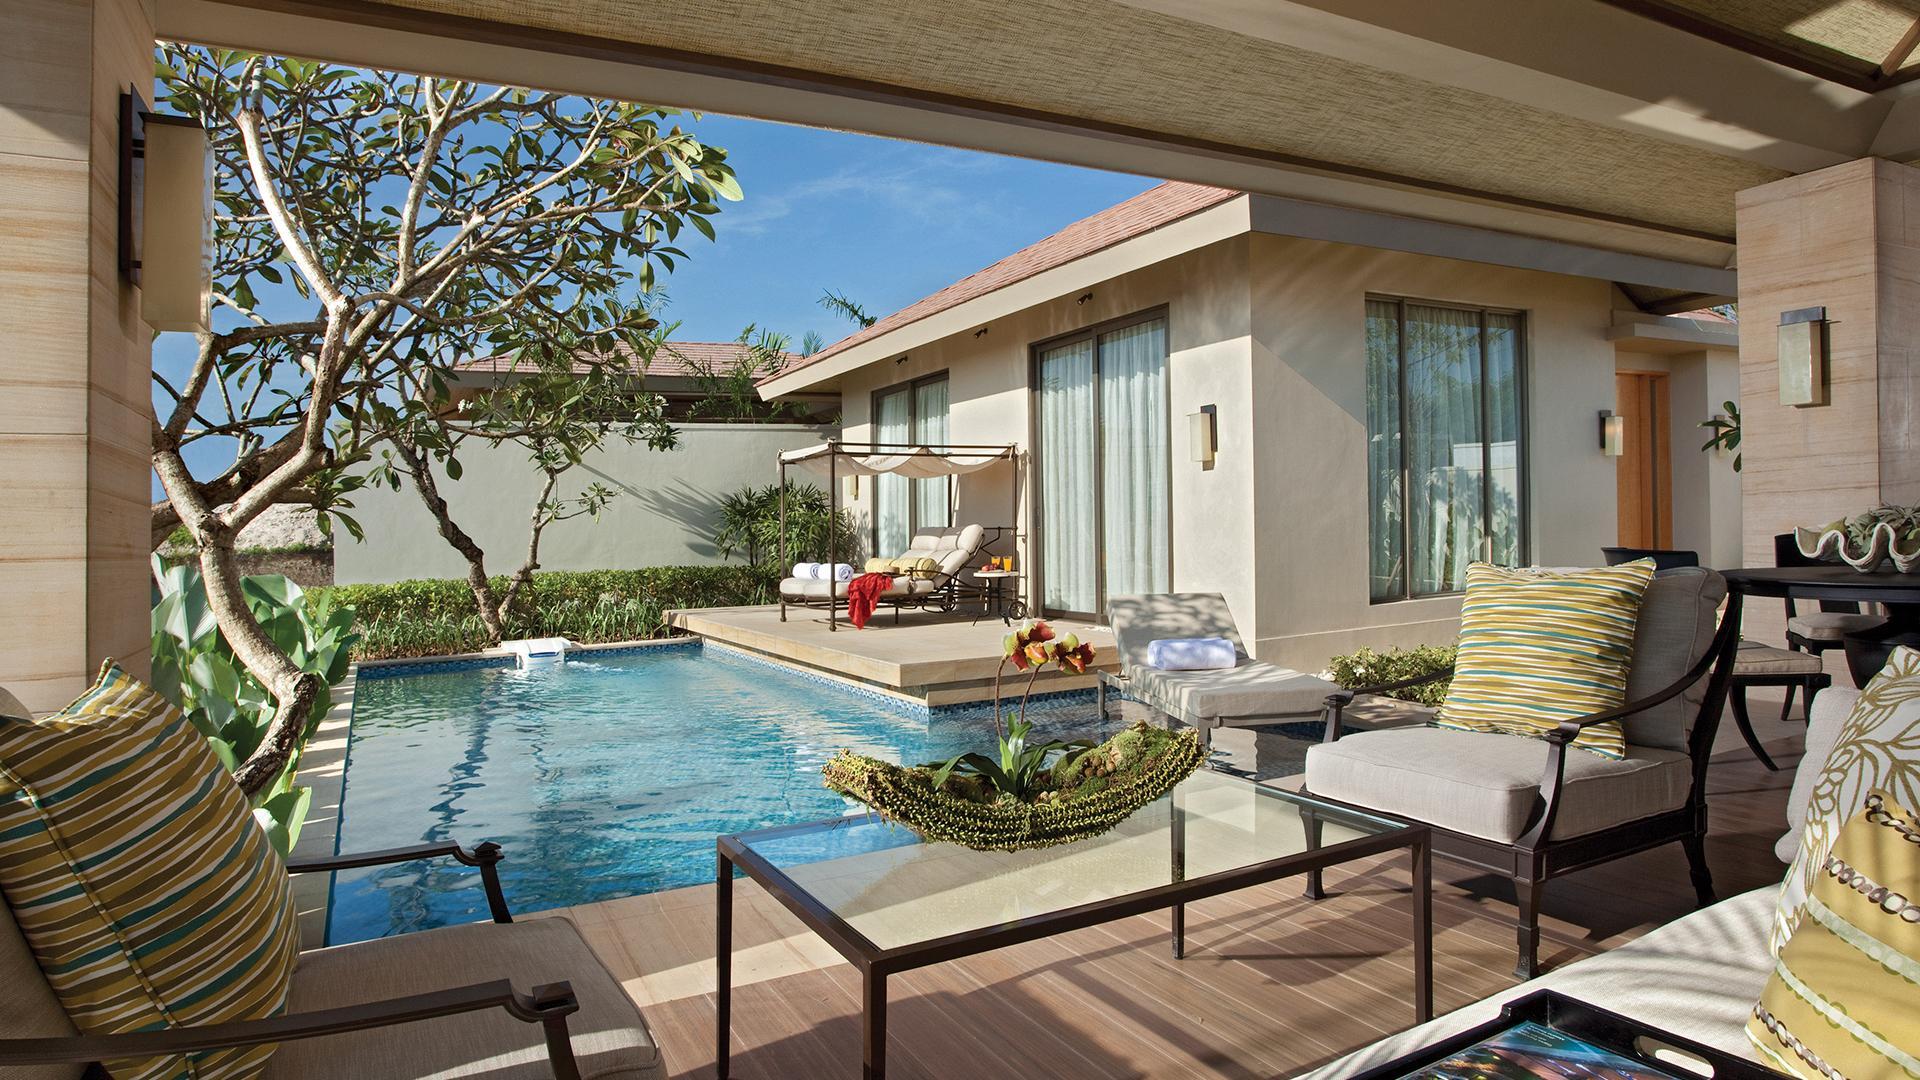 One-Bedroom Garden Pool Villa image 1 at Mulia Villas by Kabupaten Badung, Bali, Indonesia